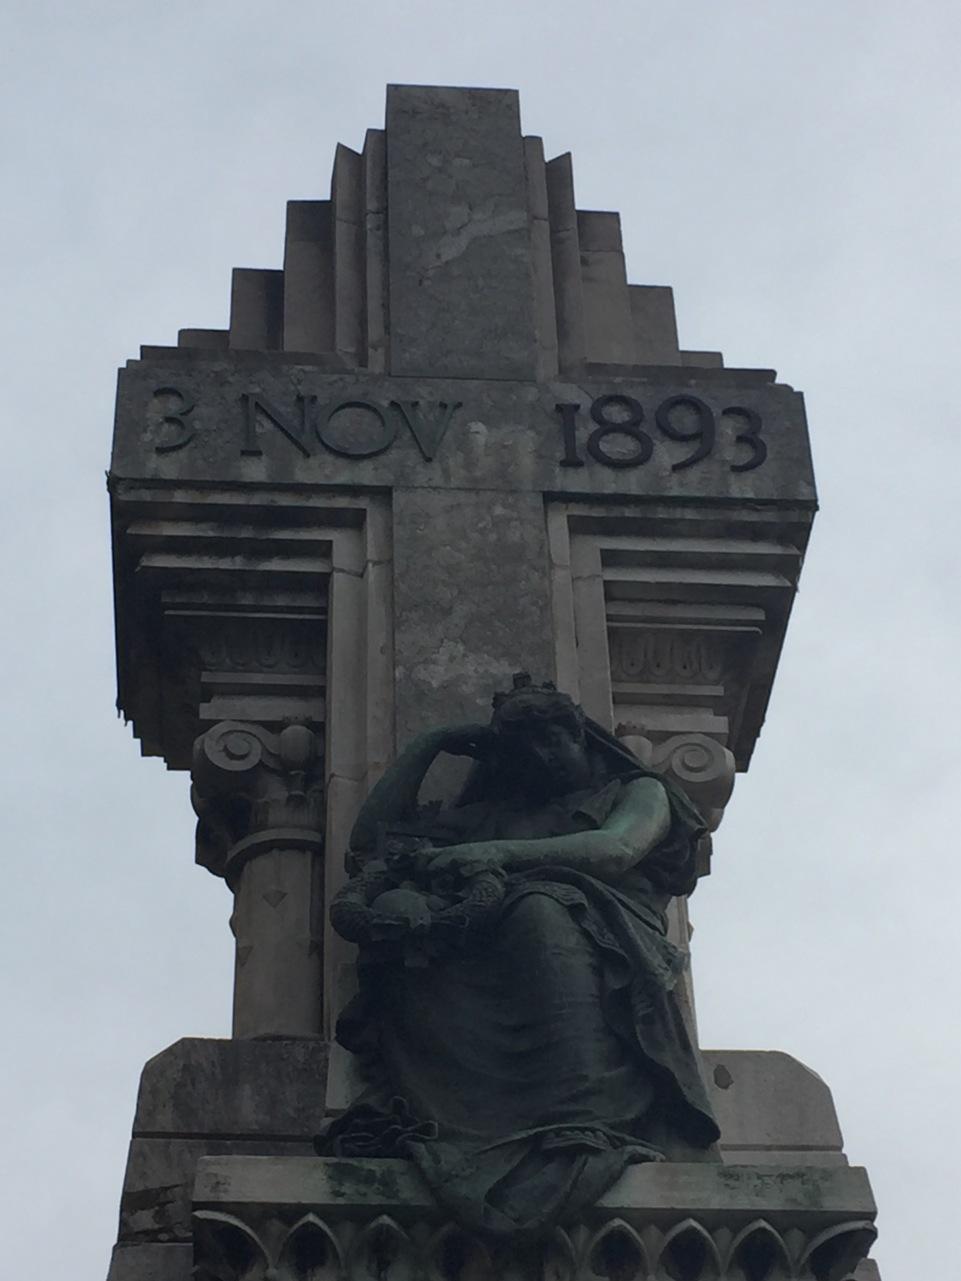 Santander Cantabria Spain monument